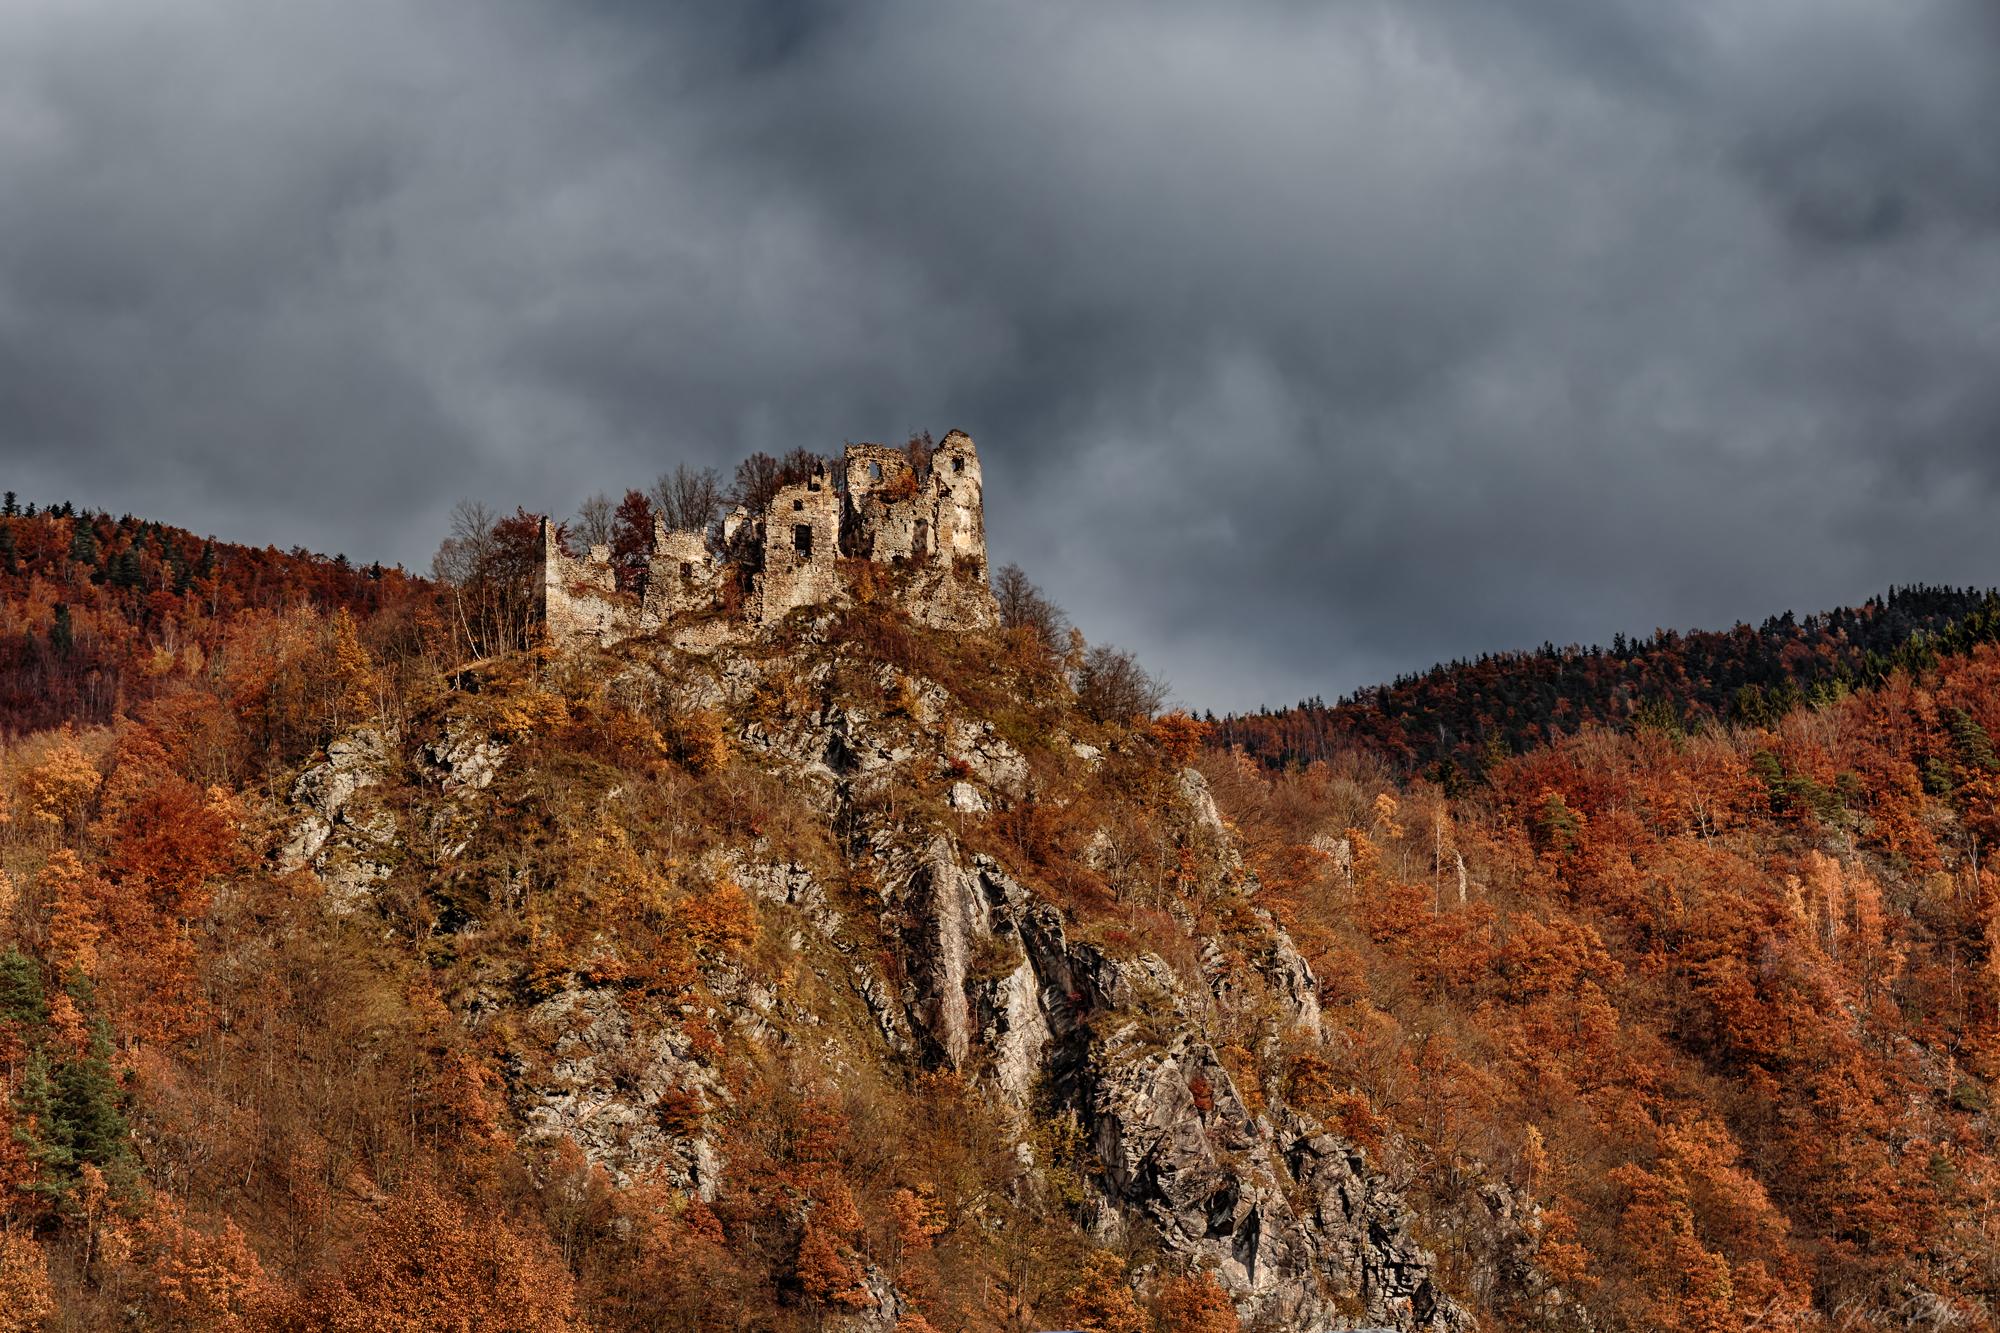 Old castle (Stary hrad), Slovakia (Slovak Republic)